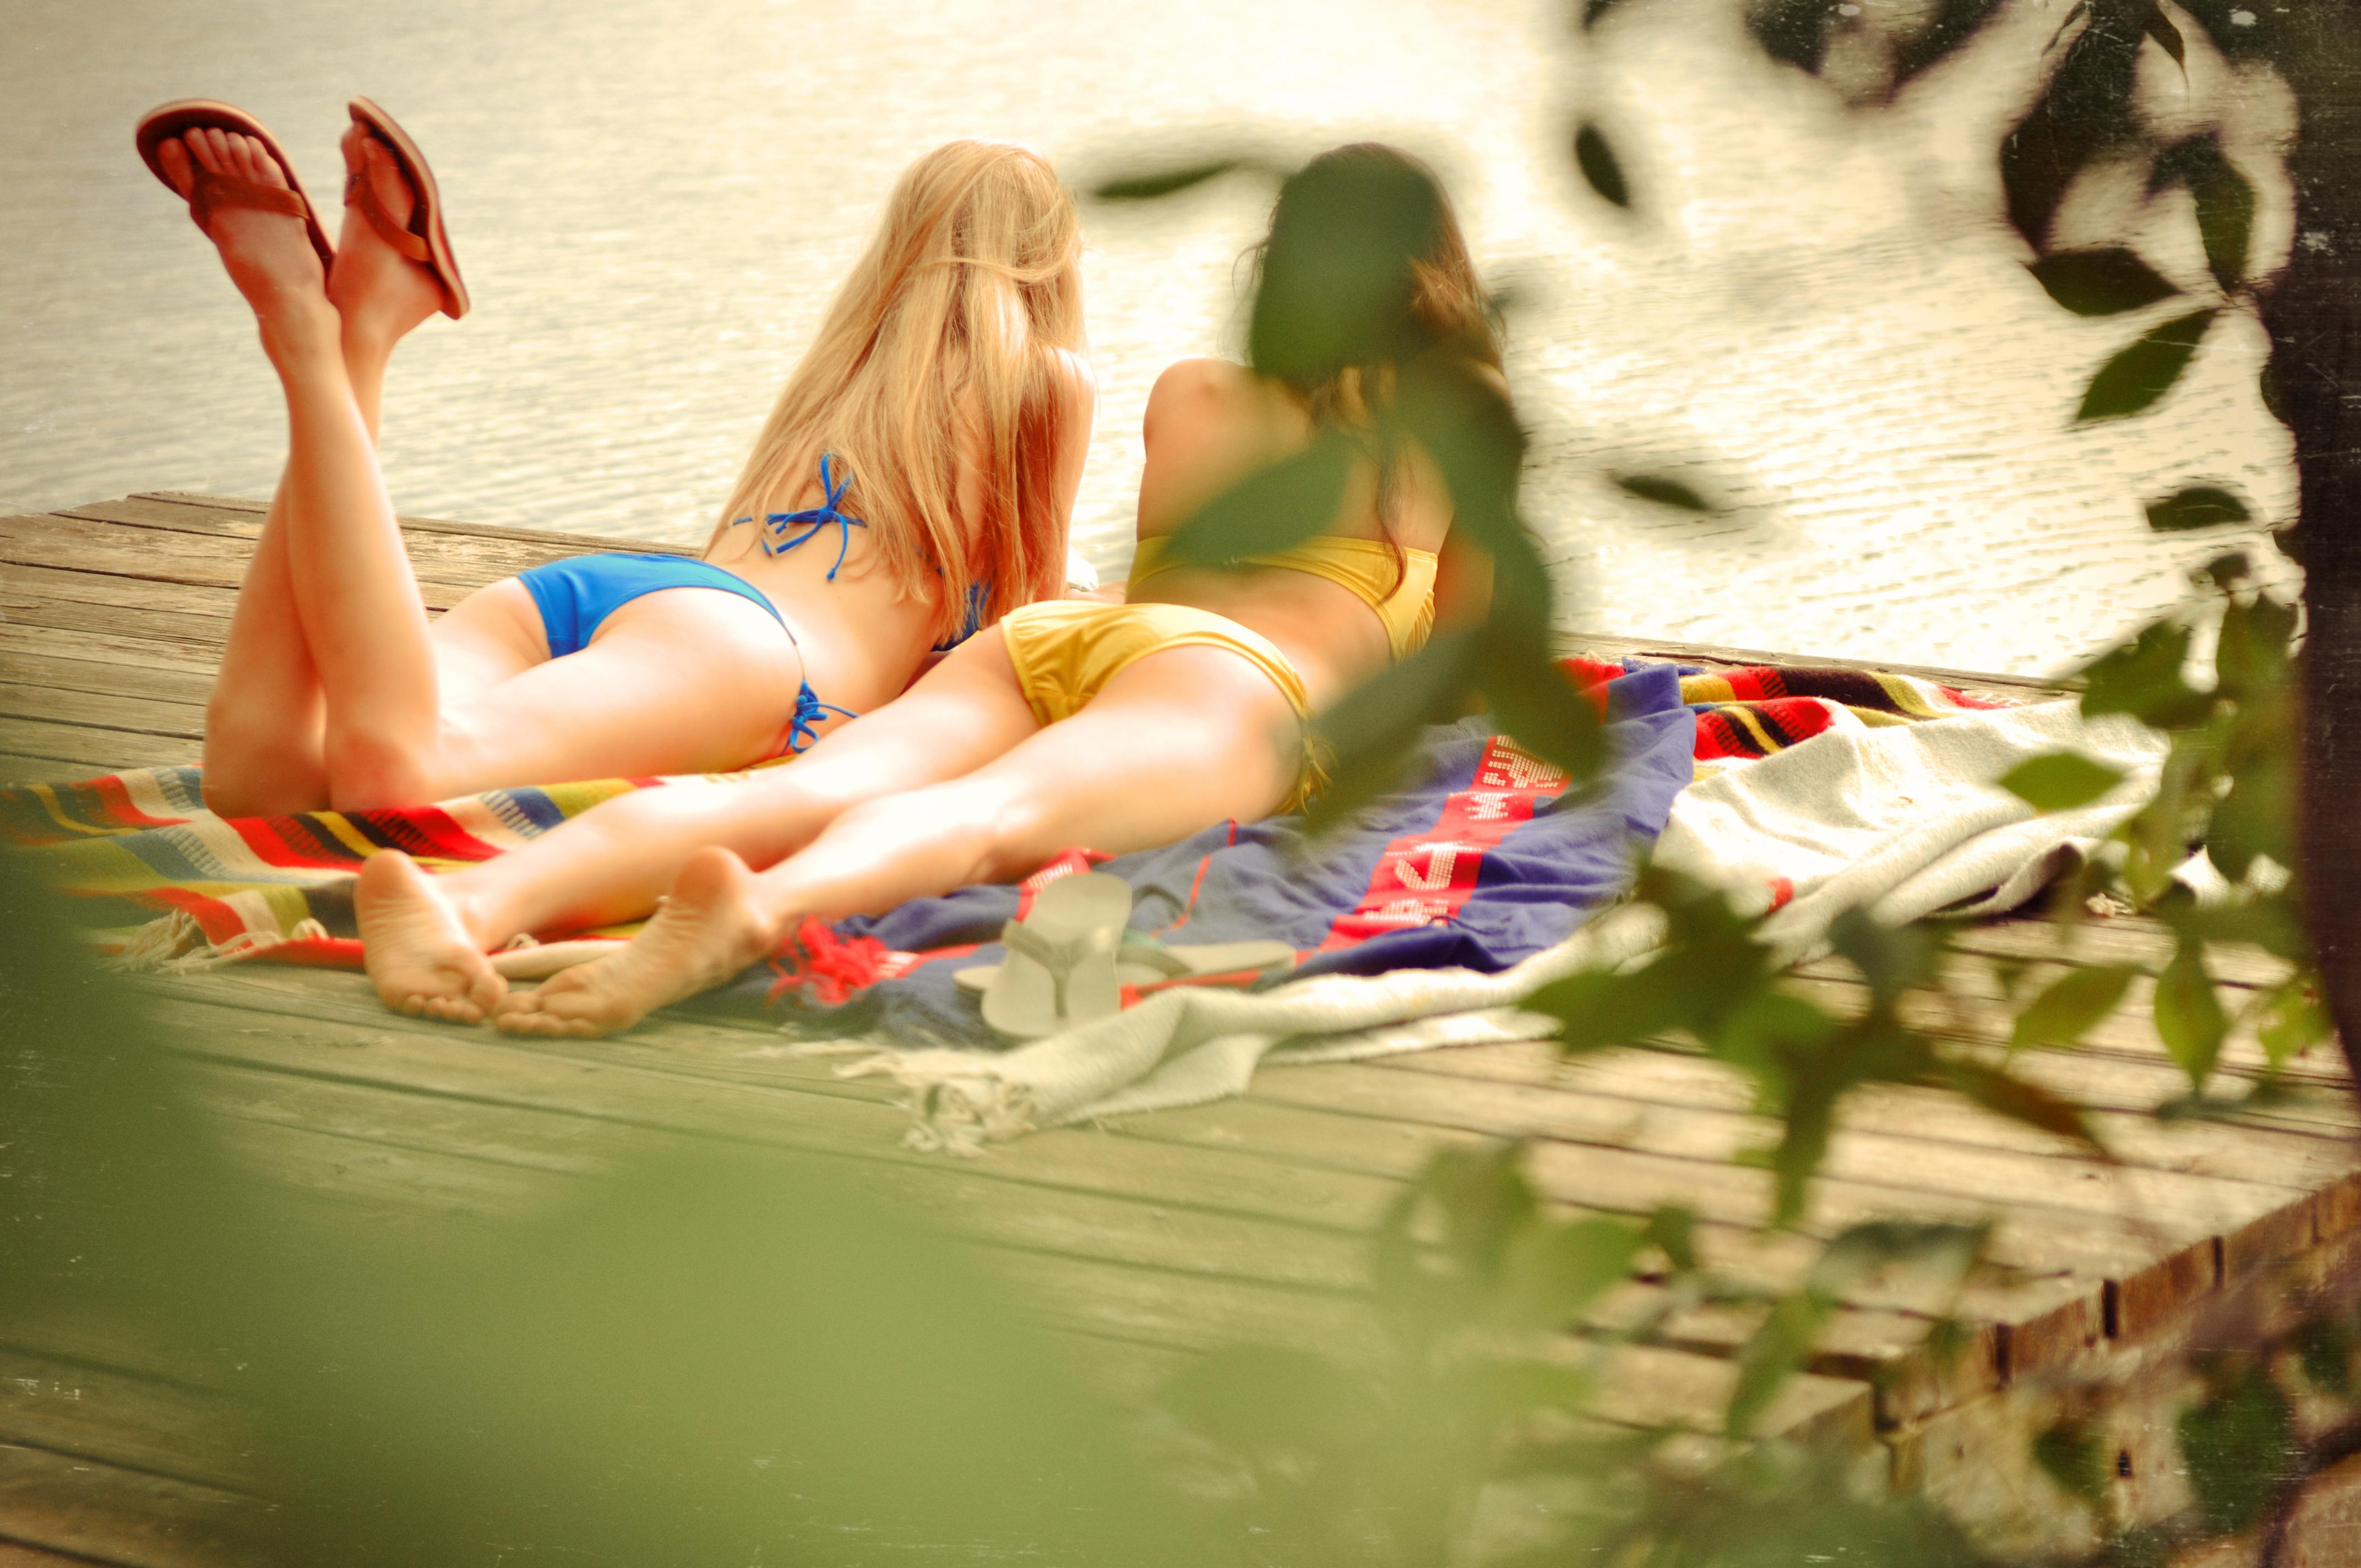 girls in flip flops